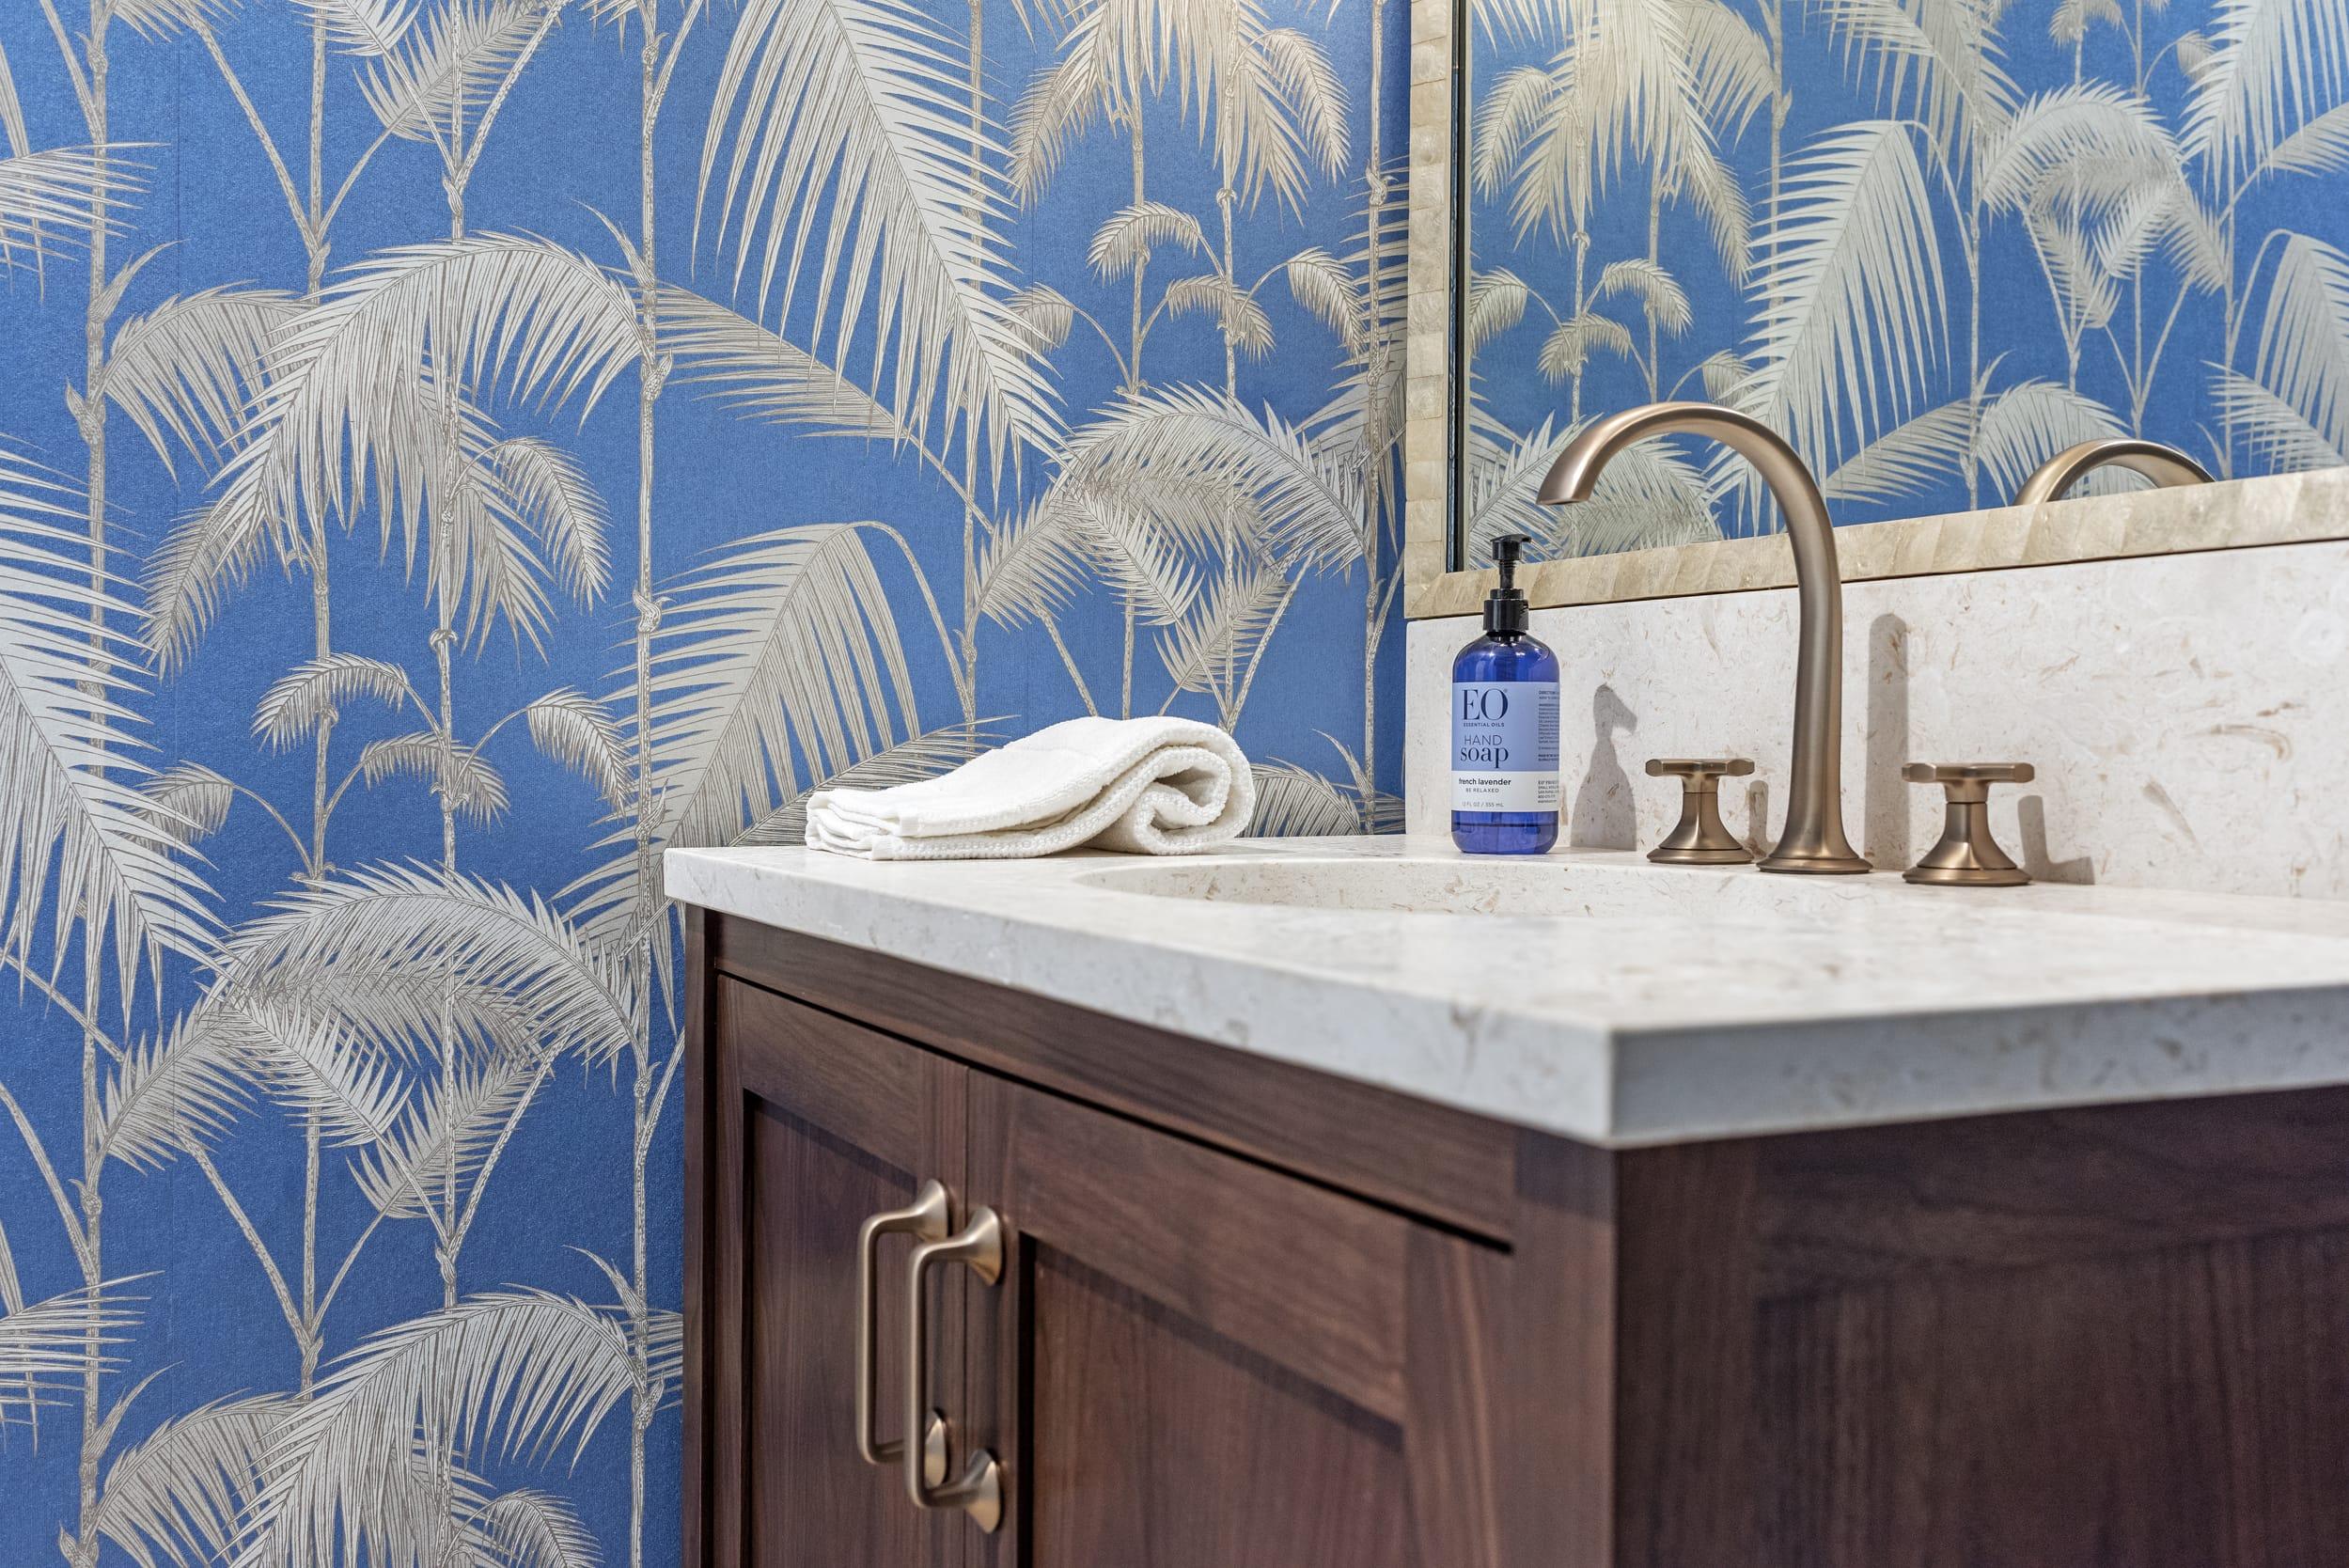 Jeffrey Fisher Home Dark Wood Cabinet Stone Sink Gold Fosset Blue Fern Wall Paper